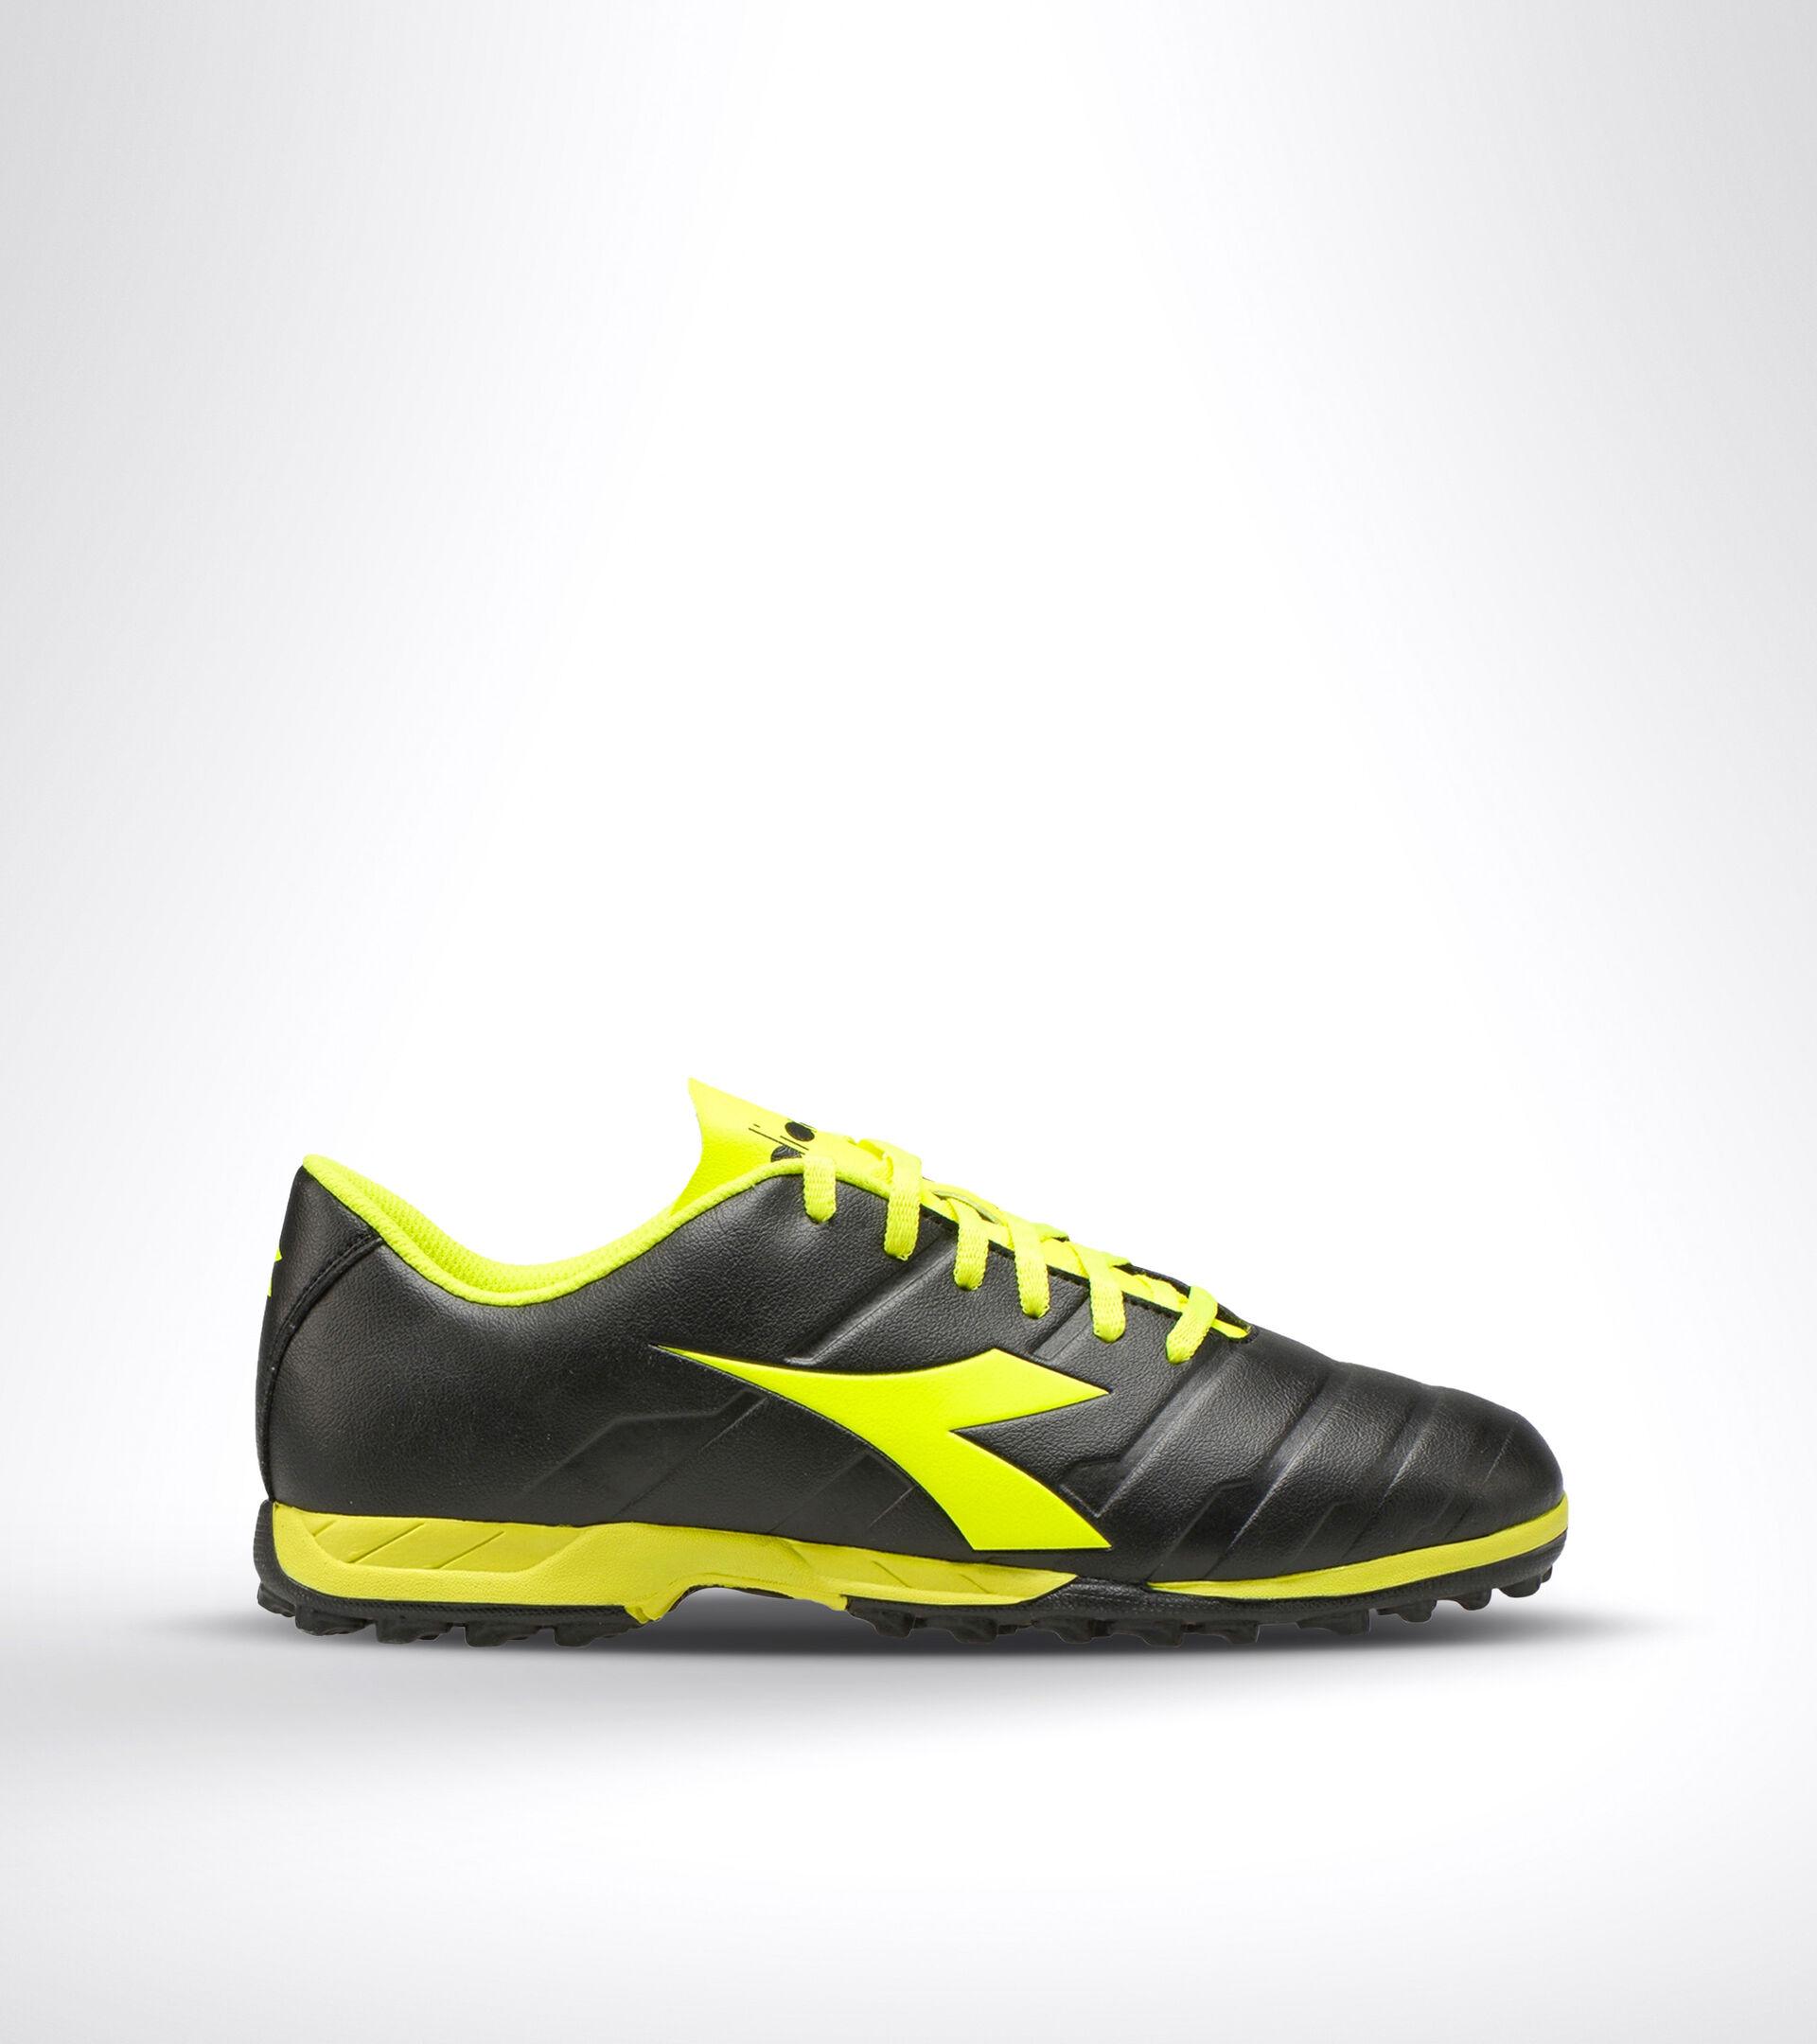 Footwear Sport UOMO PICHICHI 3 TF NERO/GIALLO FLUO DIADORA Diadora